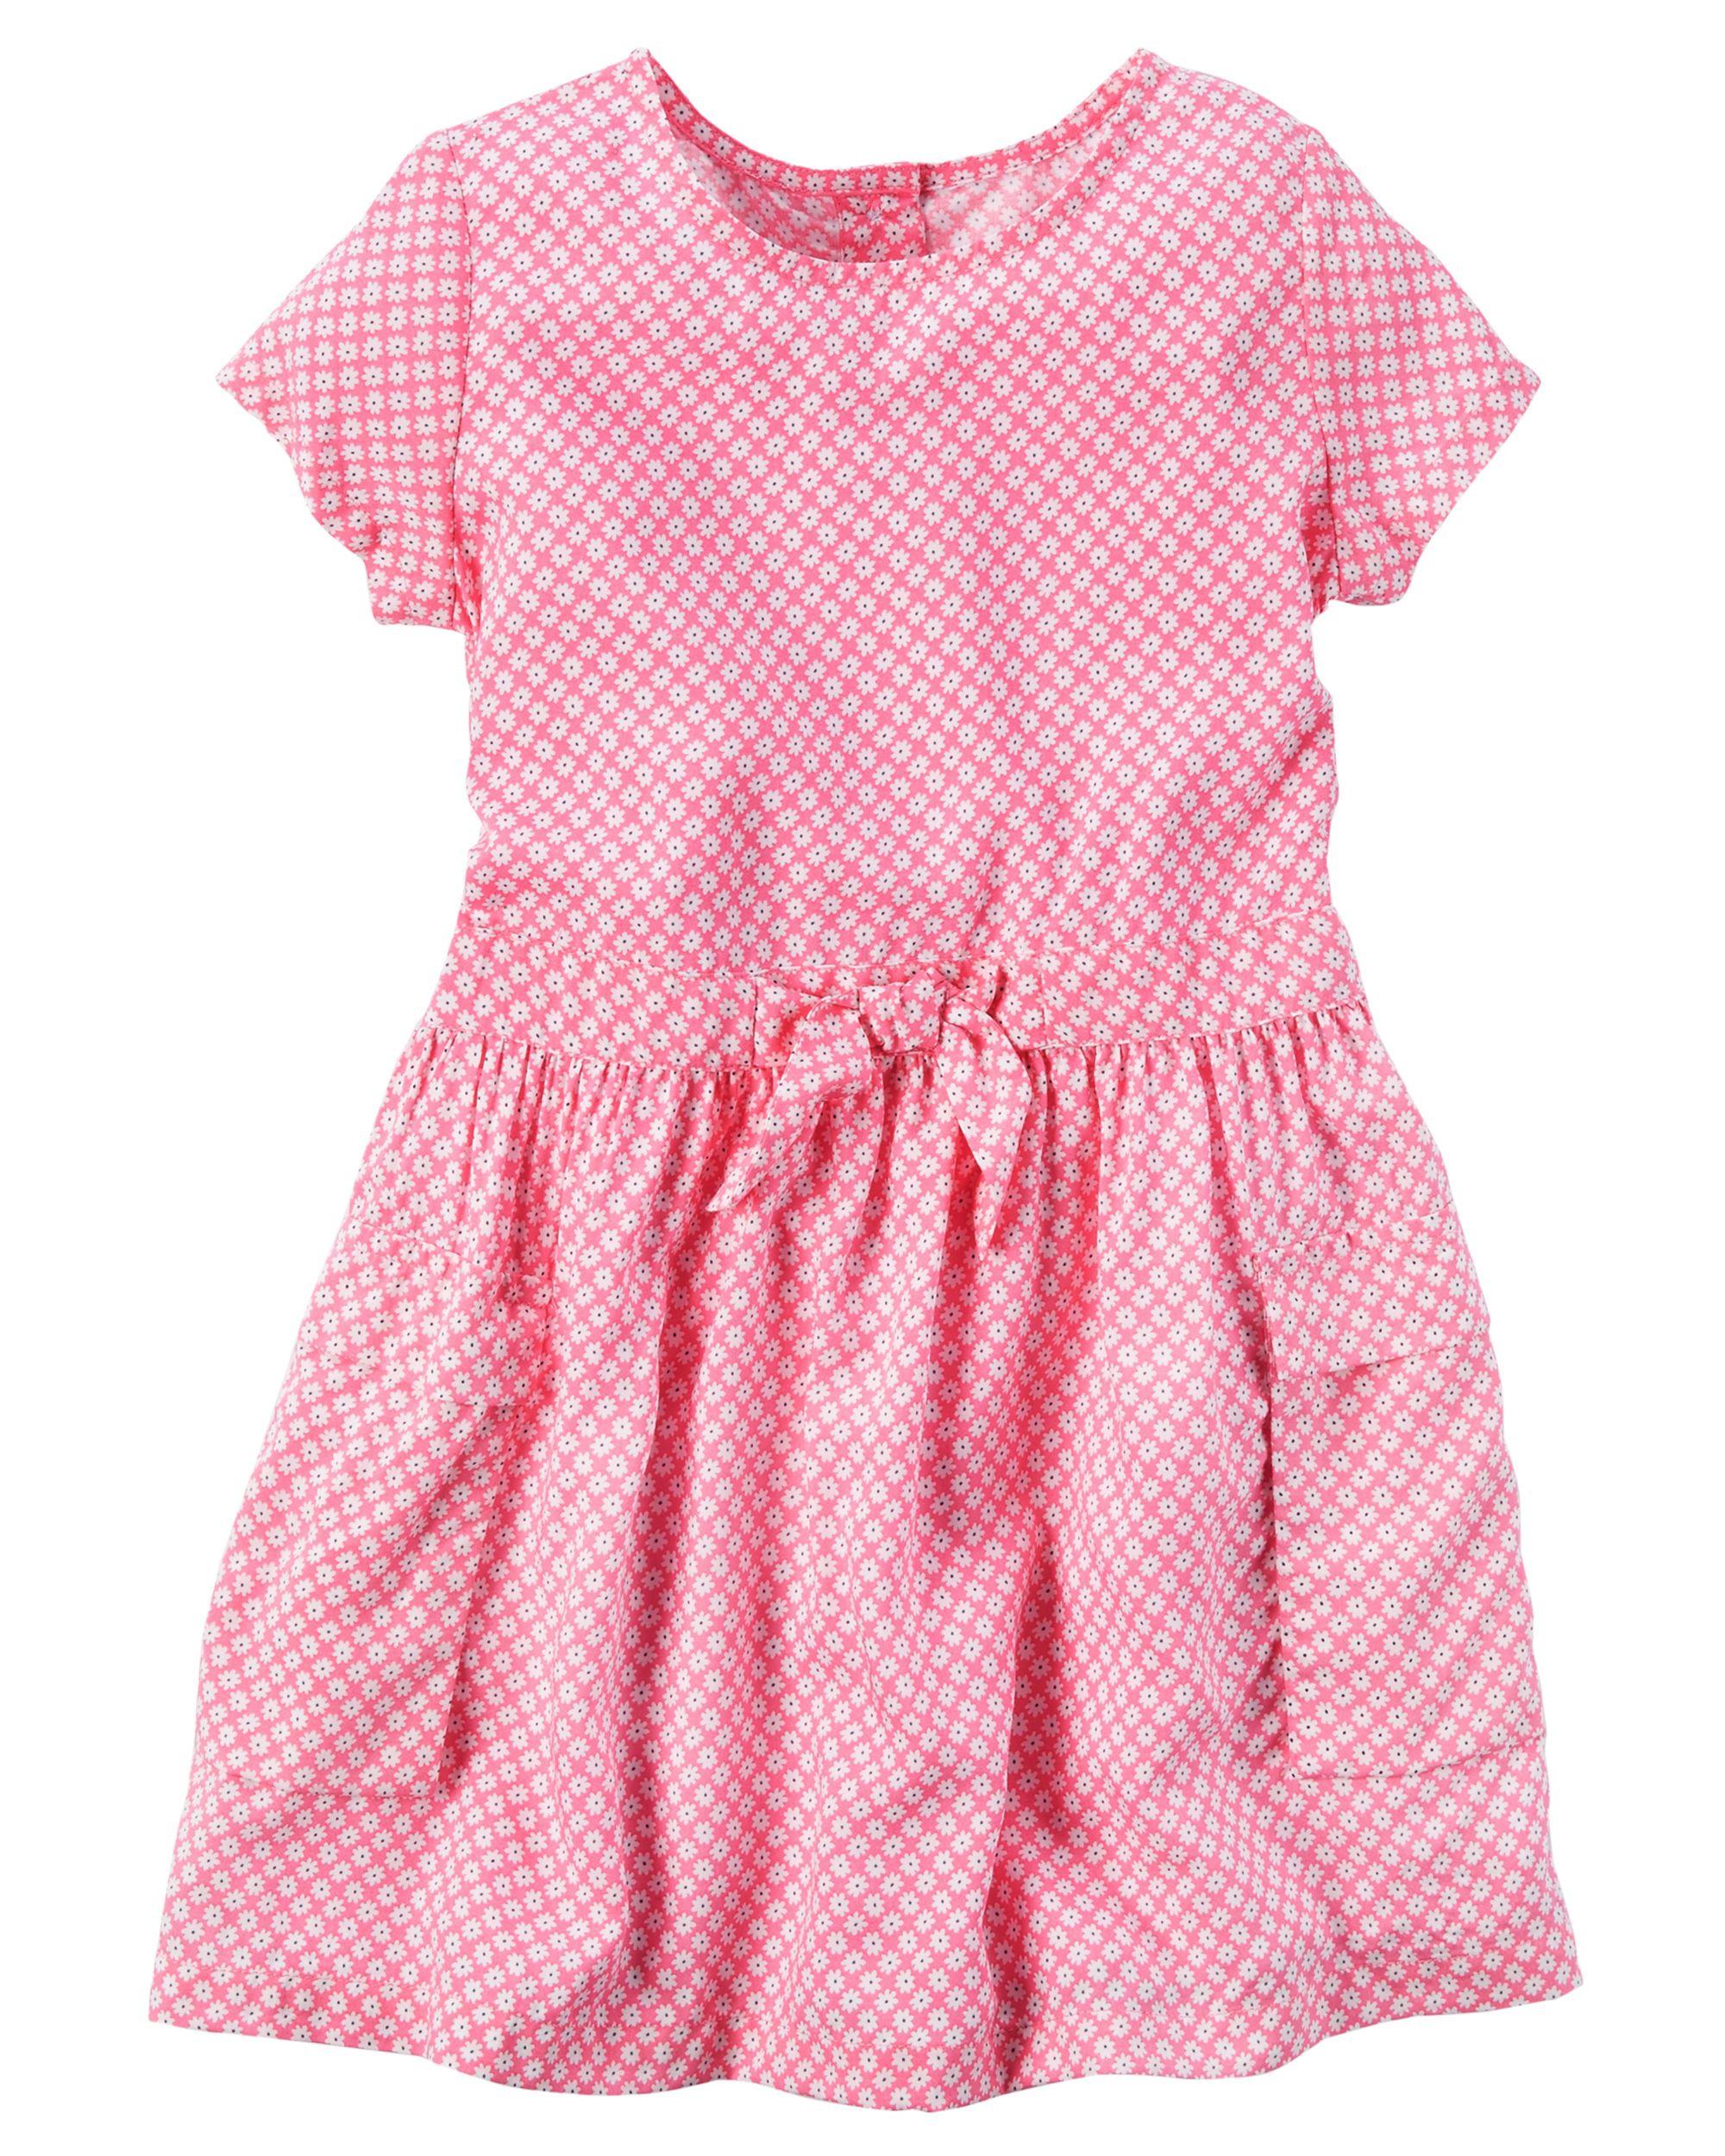 48c49336 Printed Patch Pocket Dress | Baby checklist | Girls fashion clothes ...